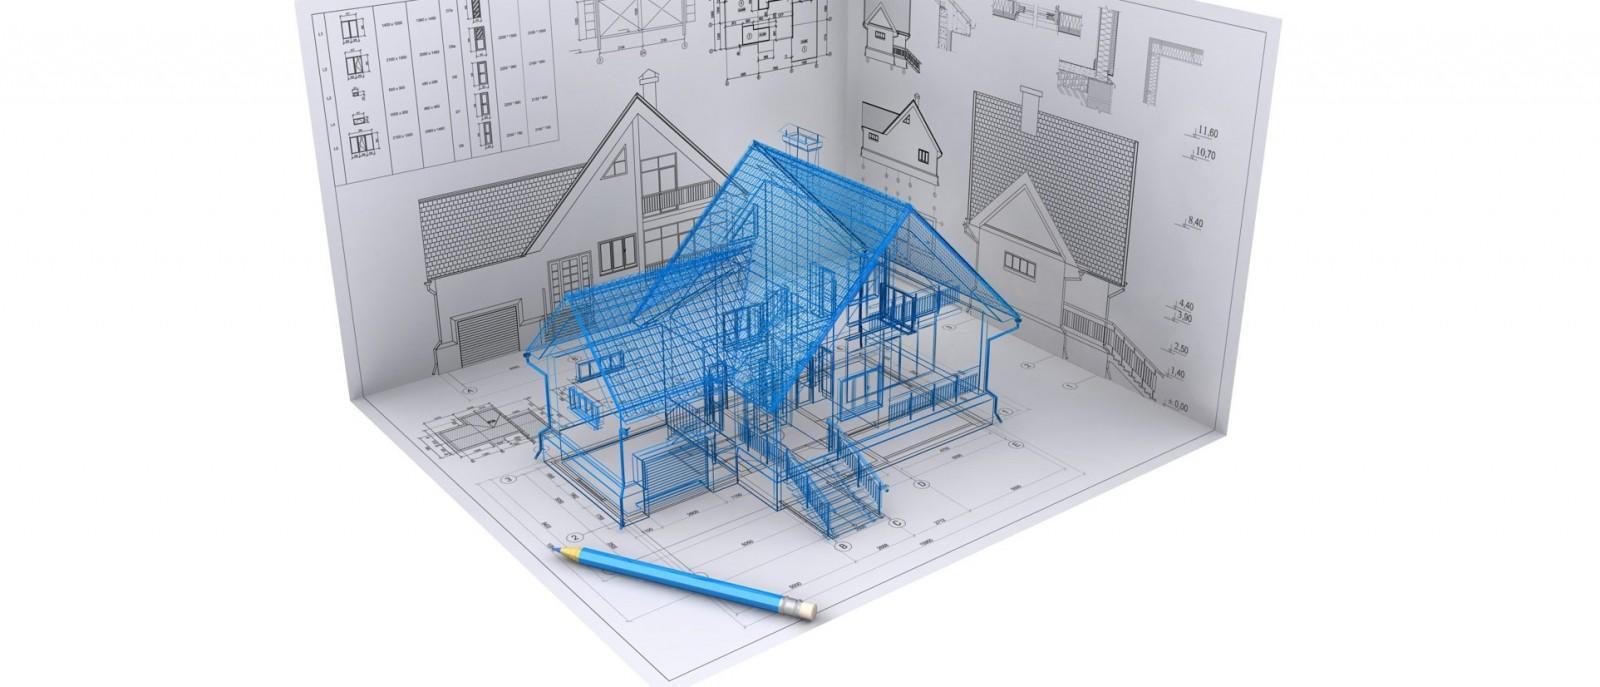 проект дома нужен или нет ?